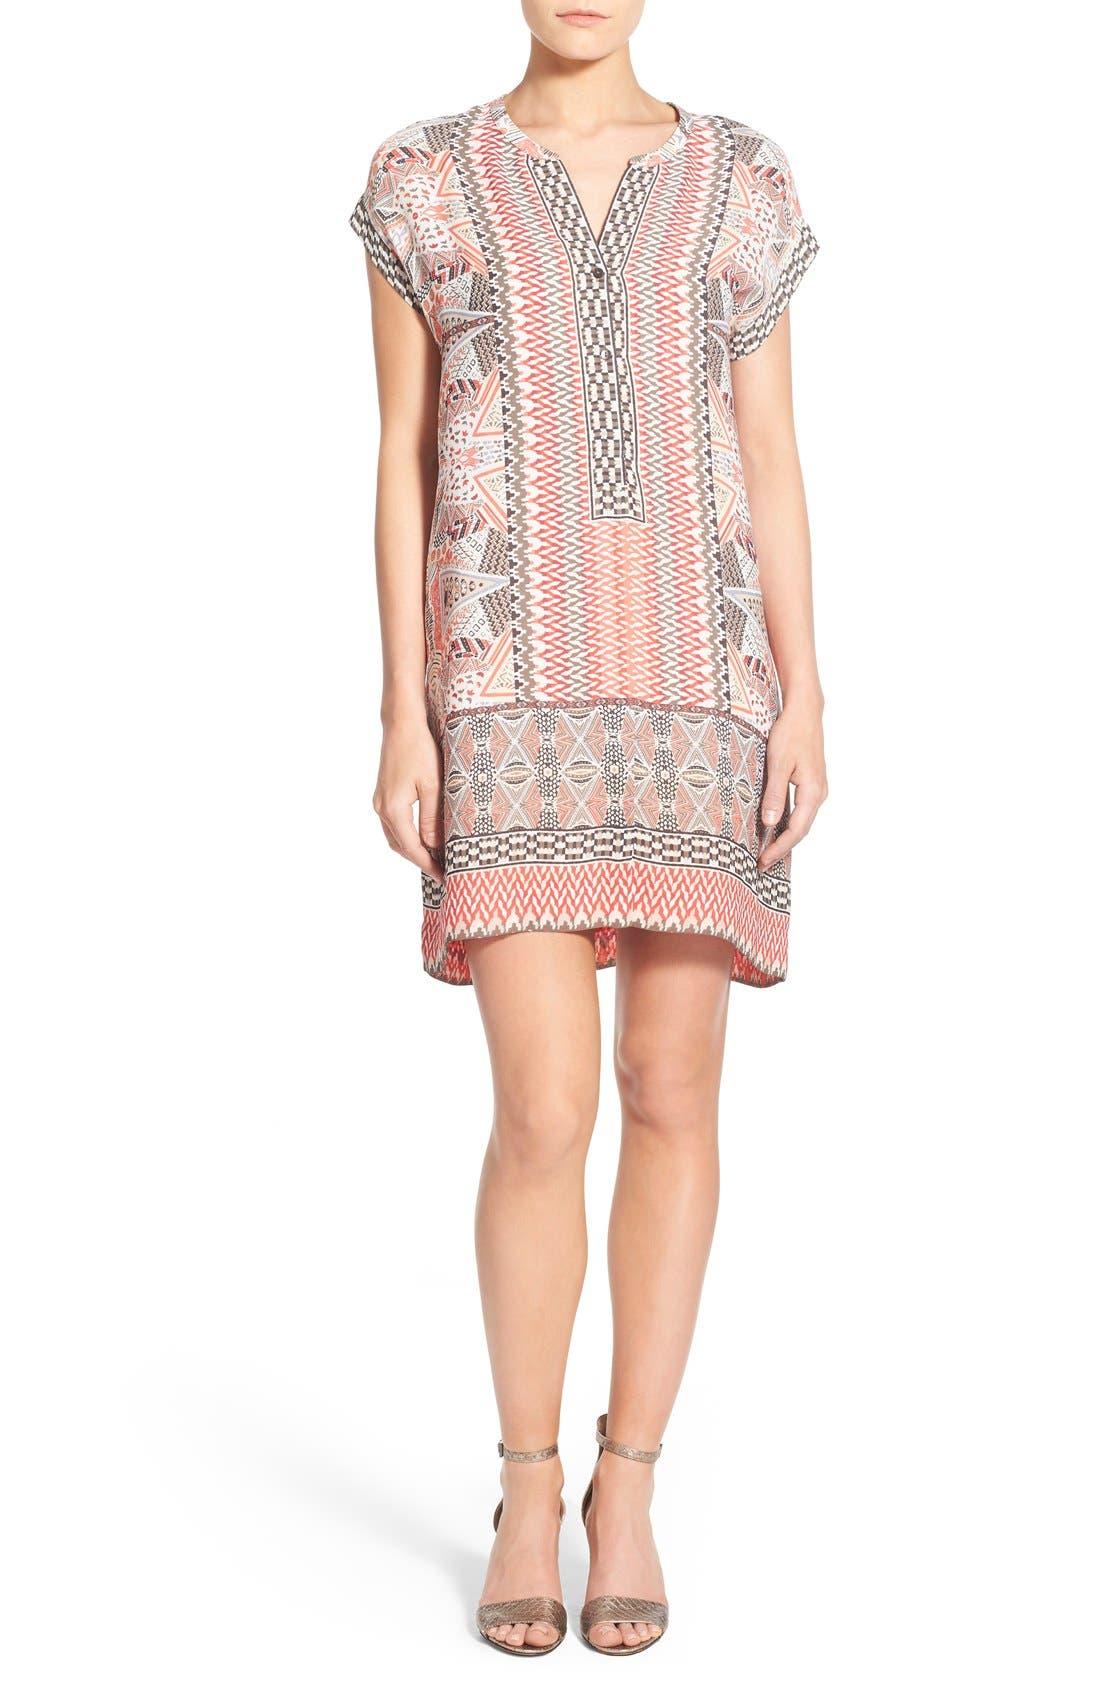 Alternate Image 1 Selected - NIC+ZOE 'Prismatic' Print Shift Dress